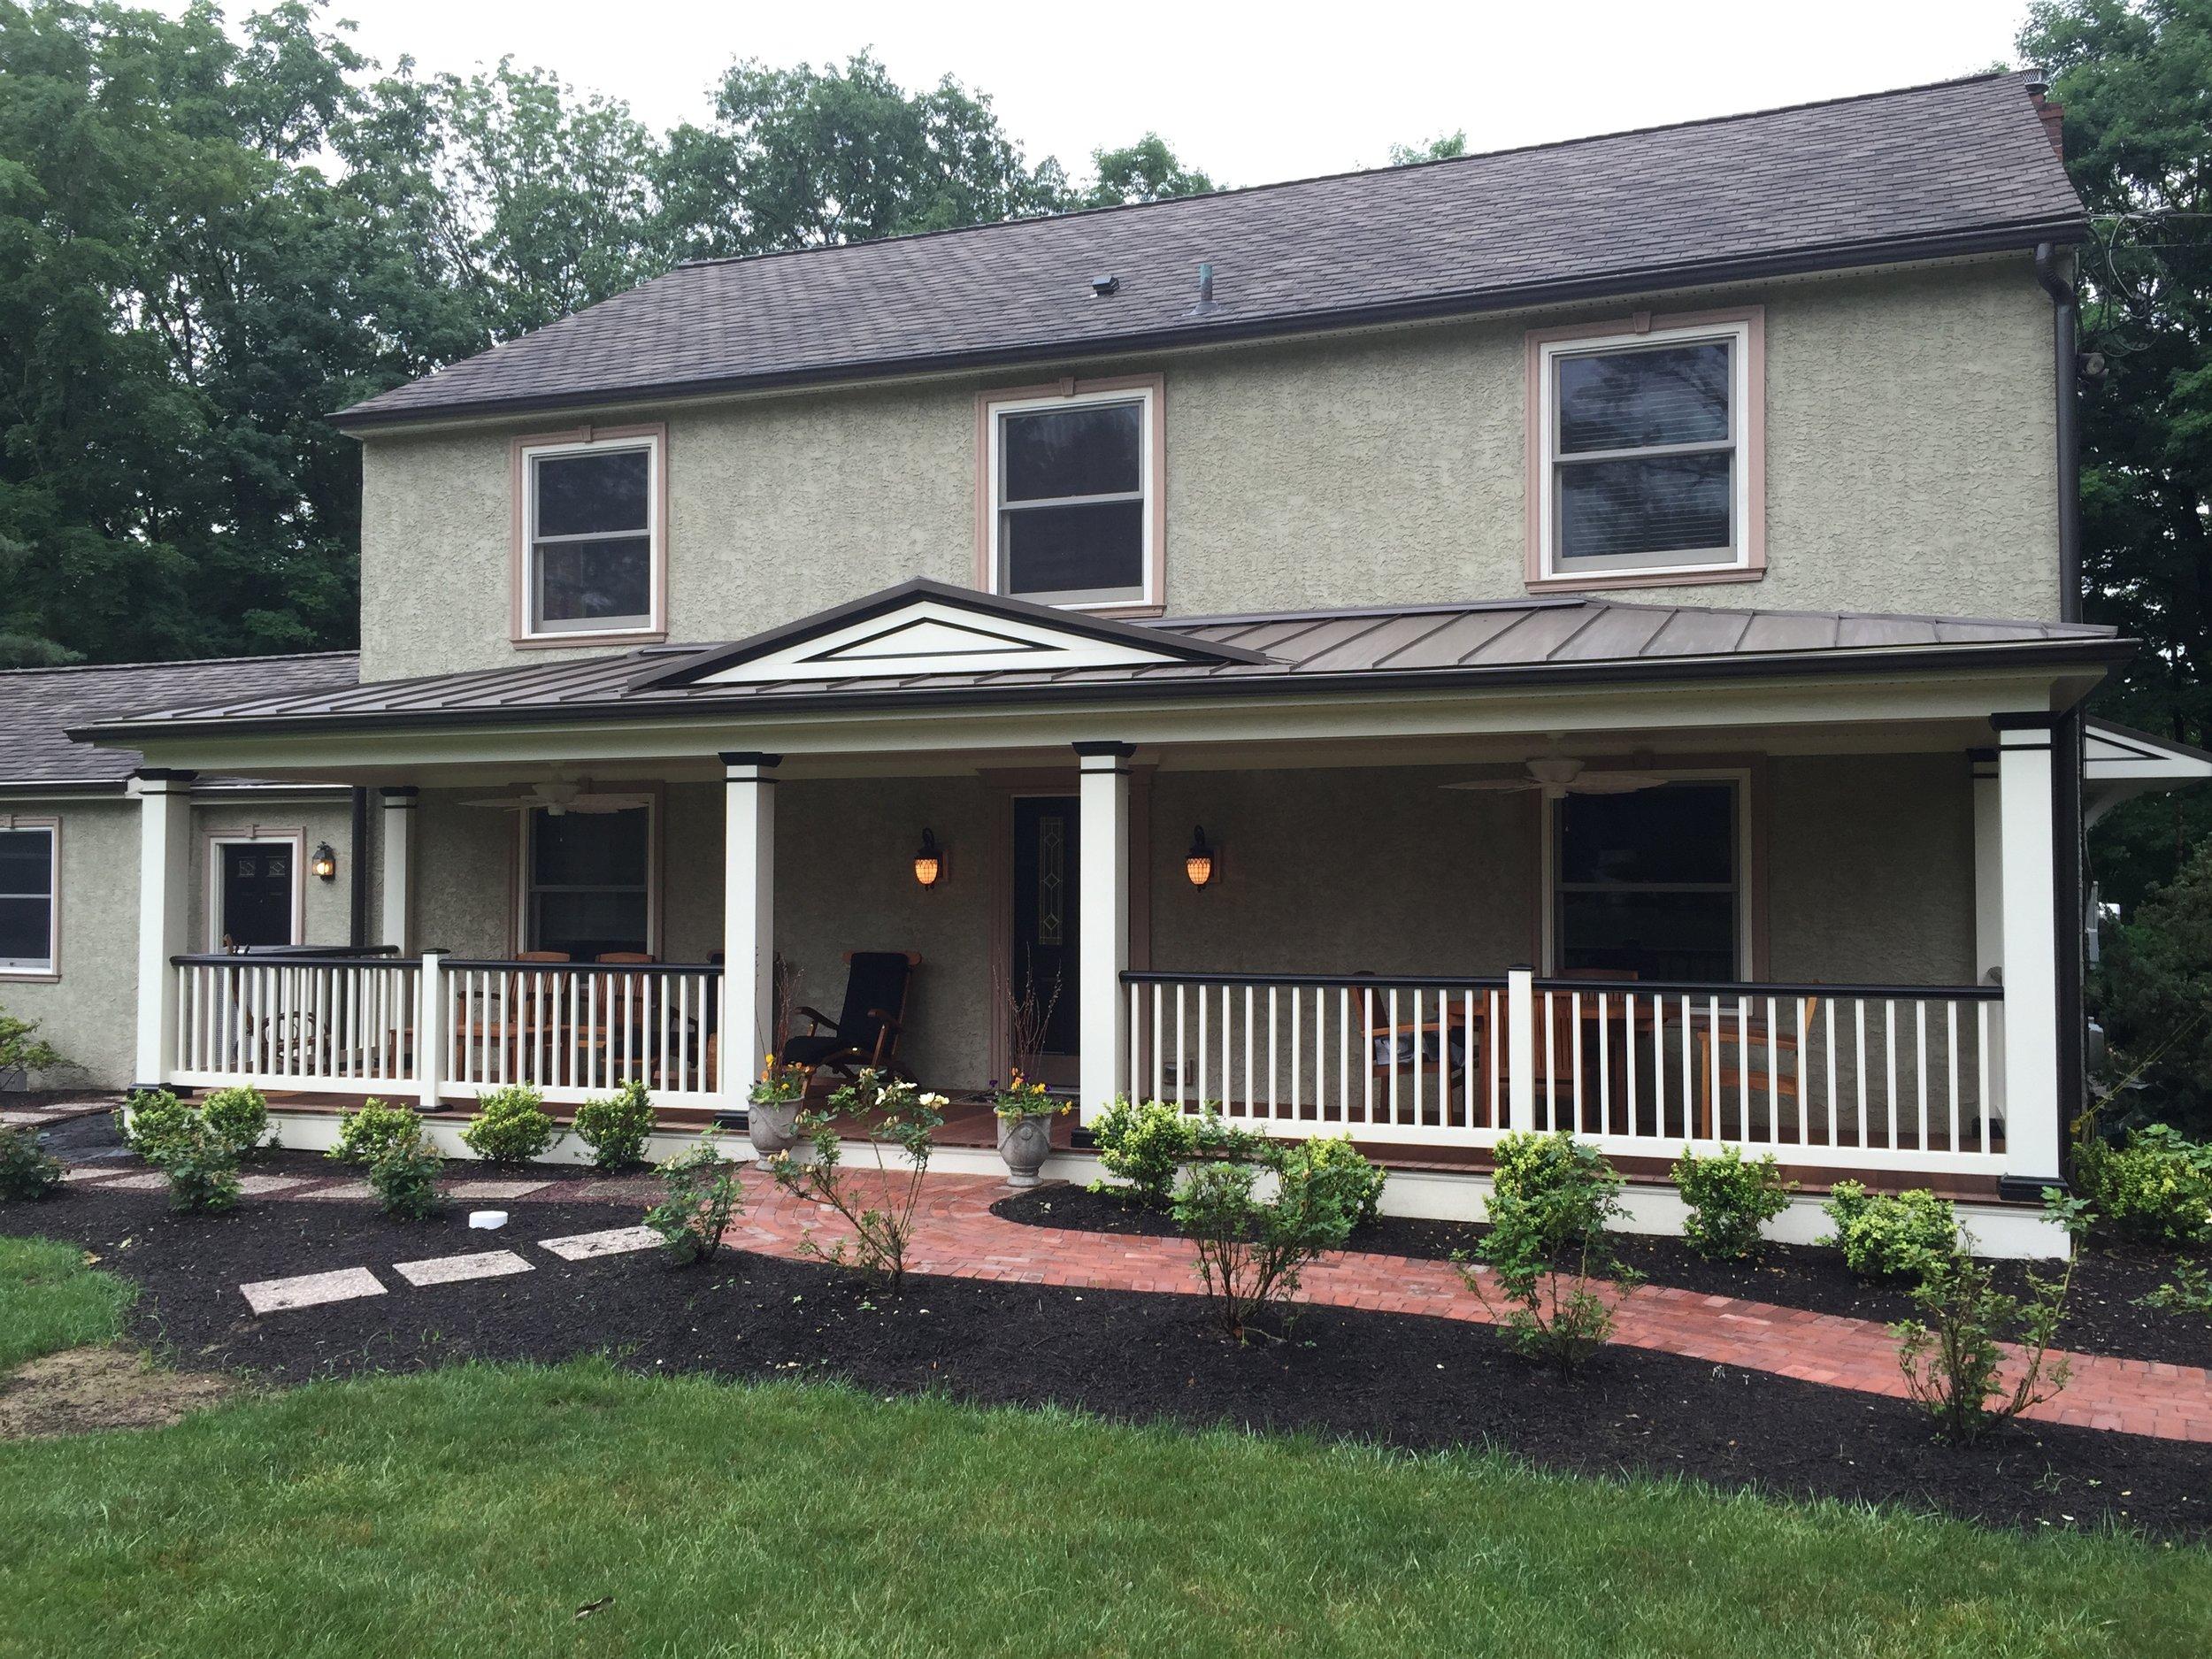 terri feralio - front porch landscaping (3).JPG